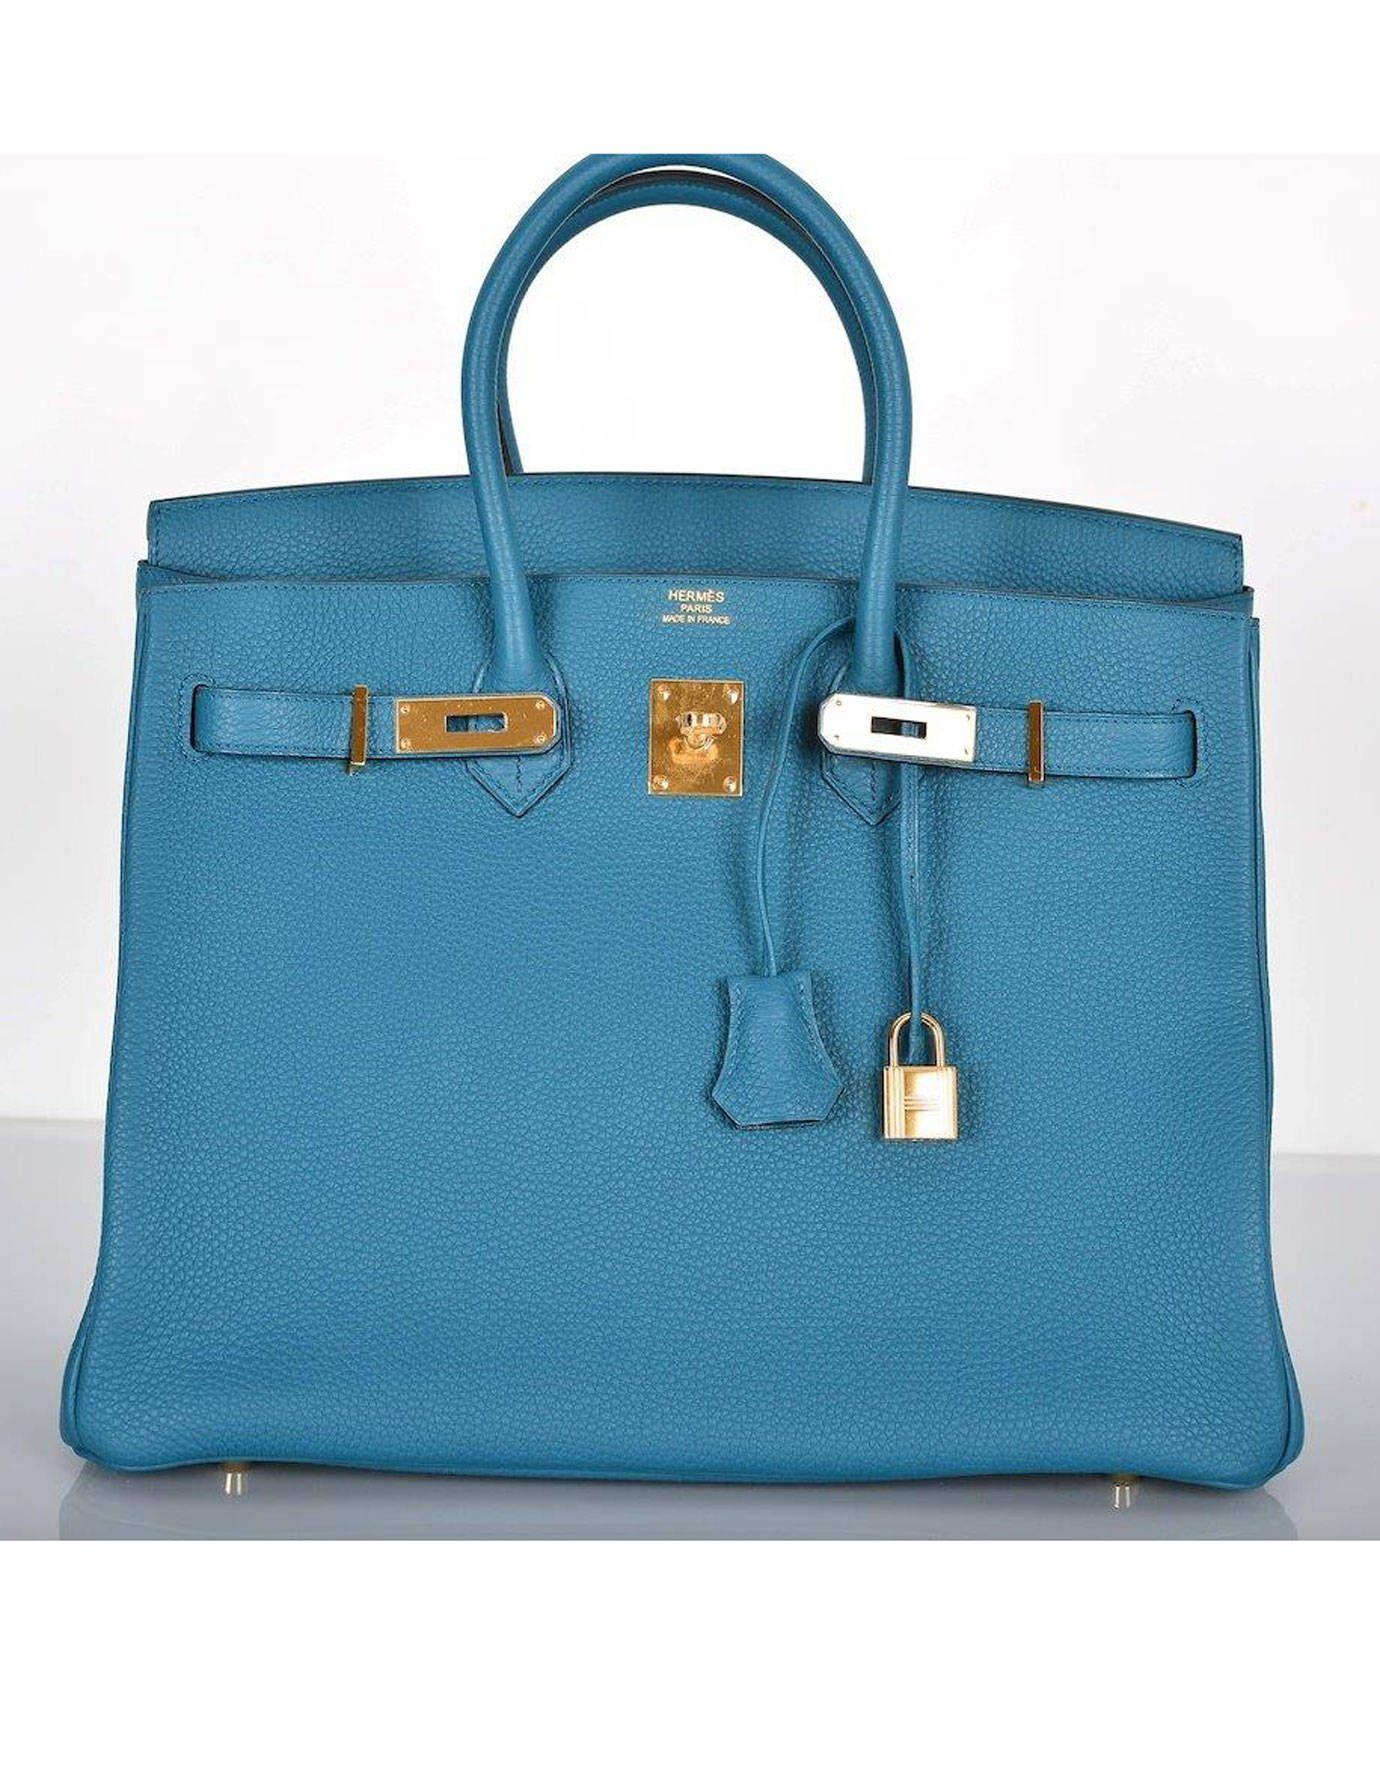 How To Spot A Fake Birkin Bag - Real Hermes Birkin Bag a57754ae73